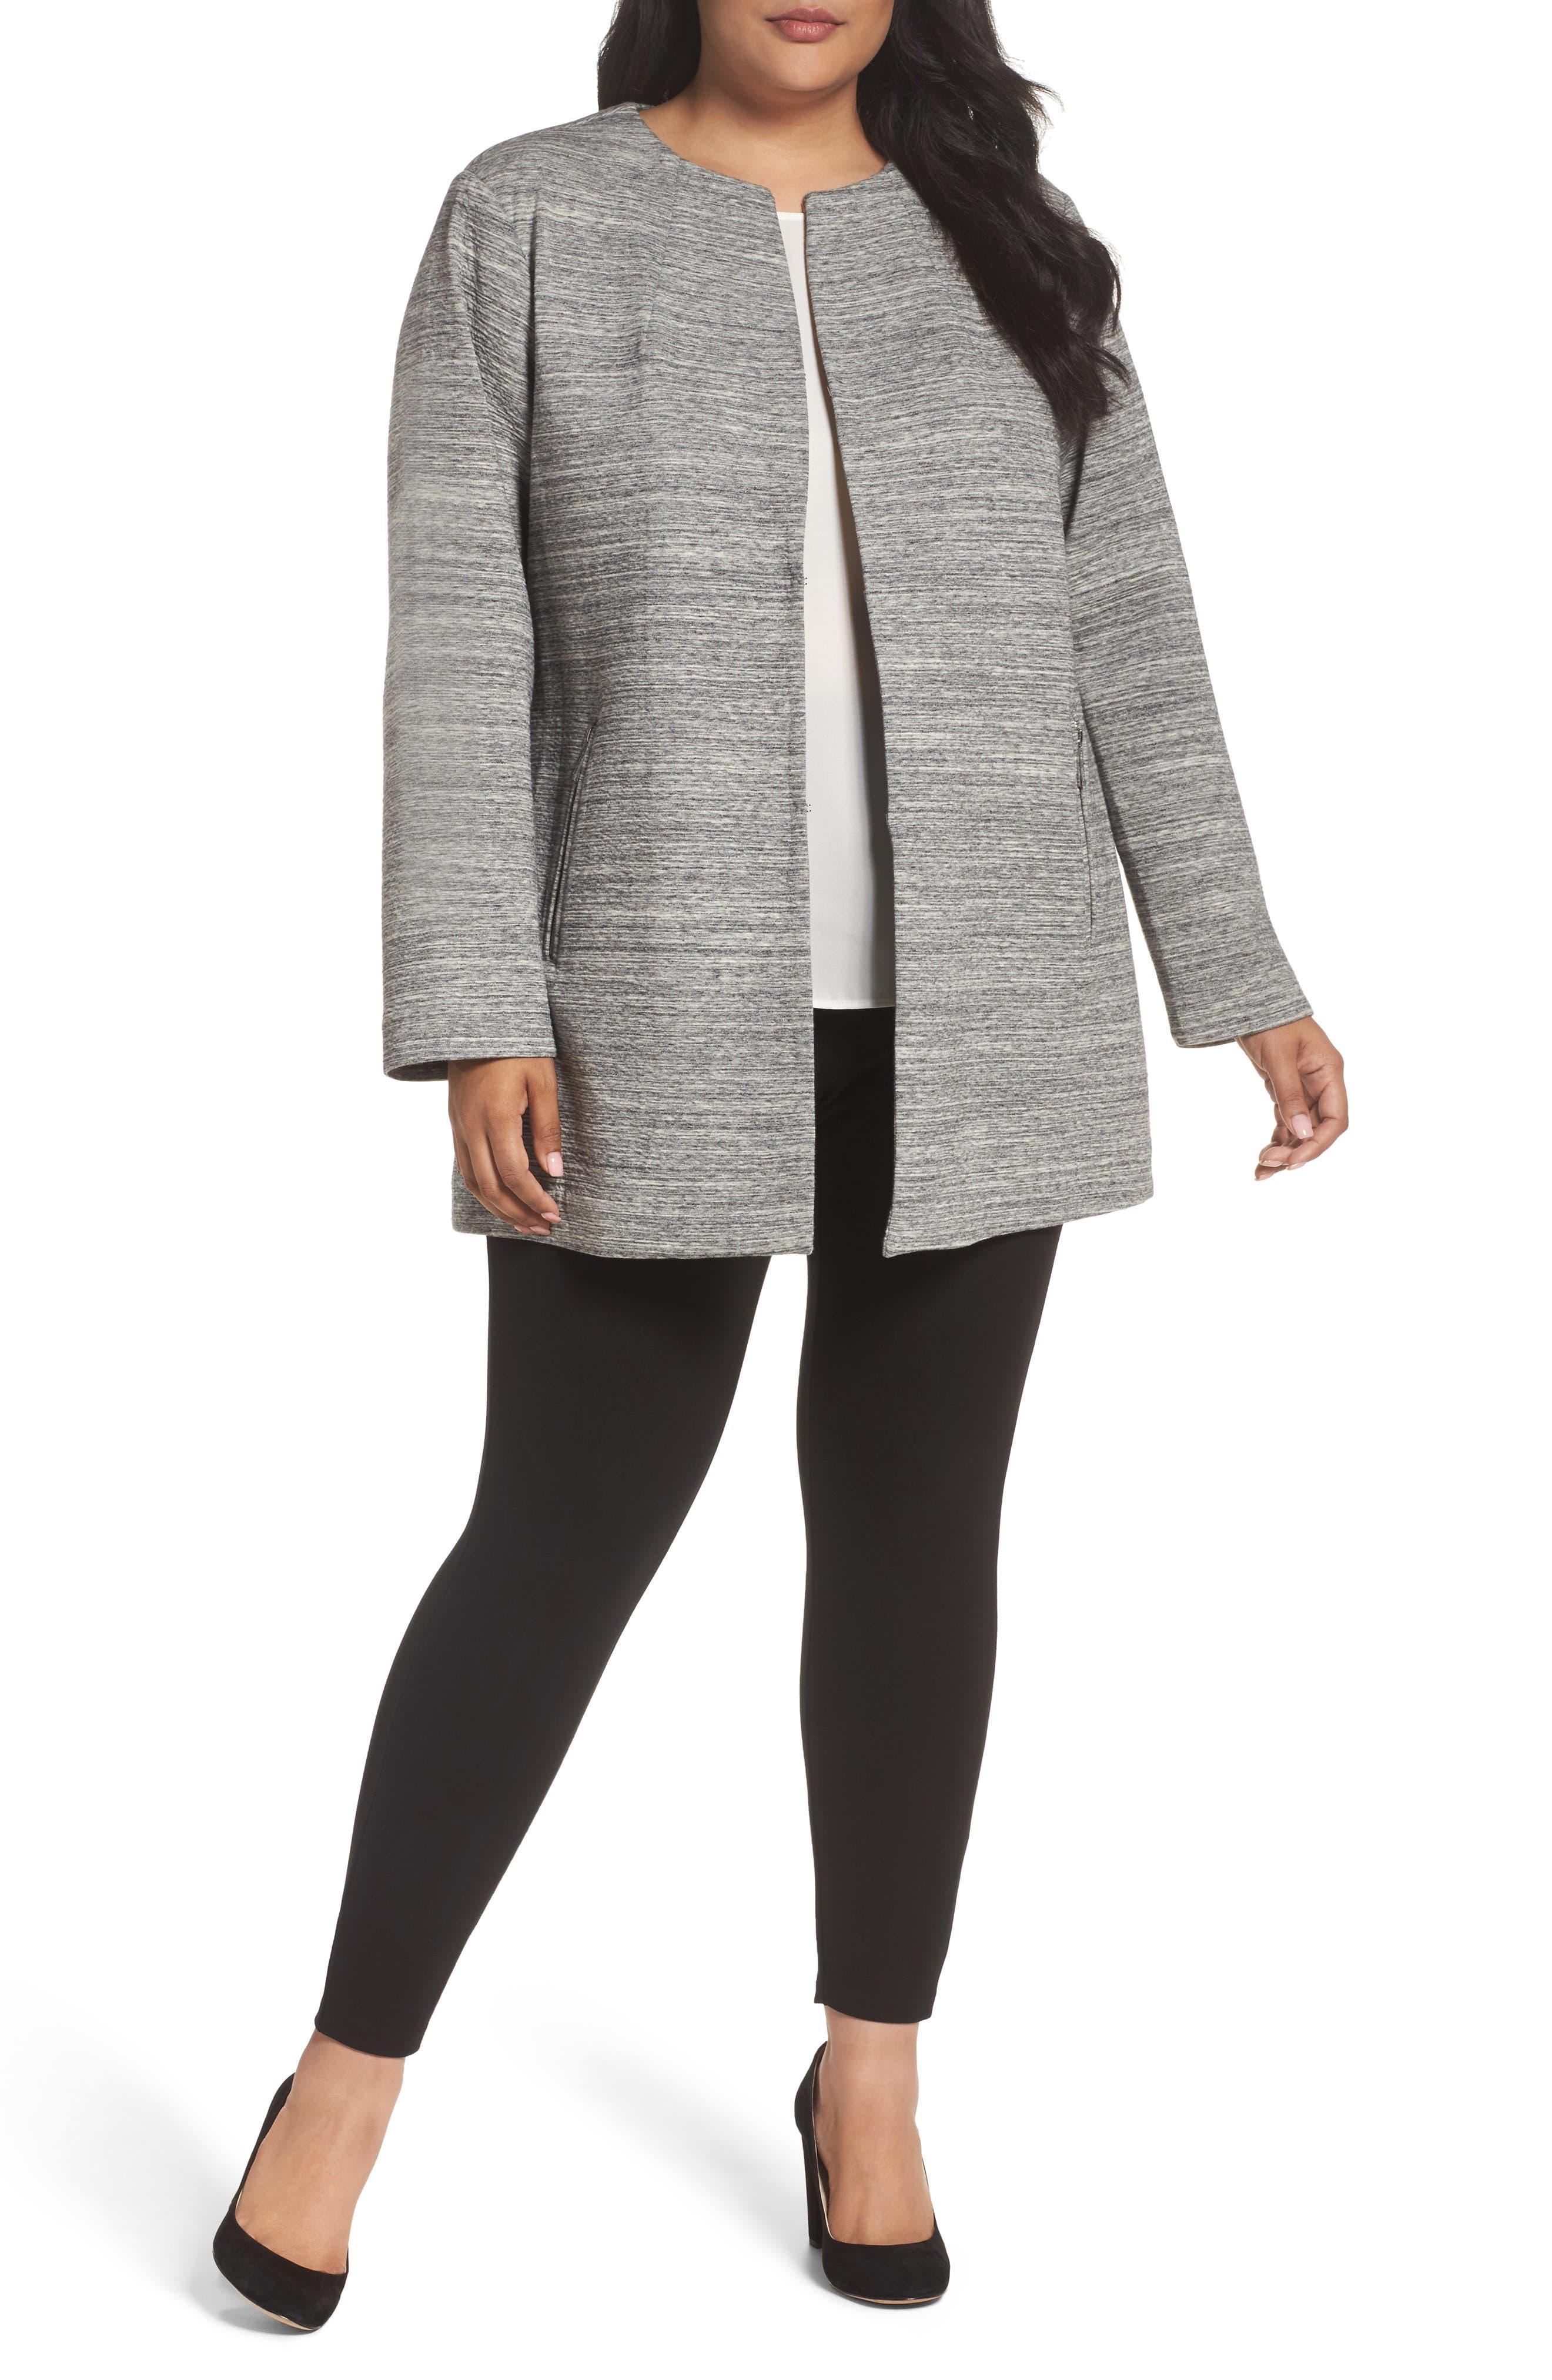 Main Image - MICHAEL Michael Kors Textured Knit Topper (Plus Size)